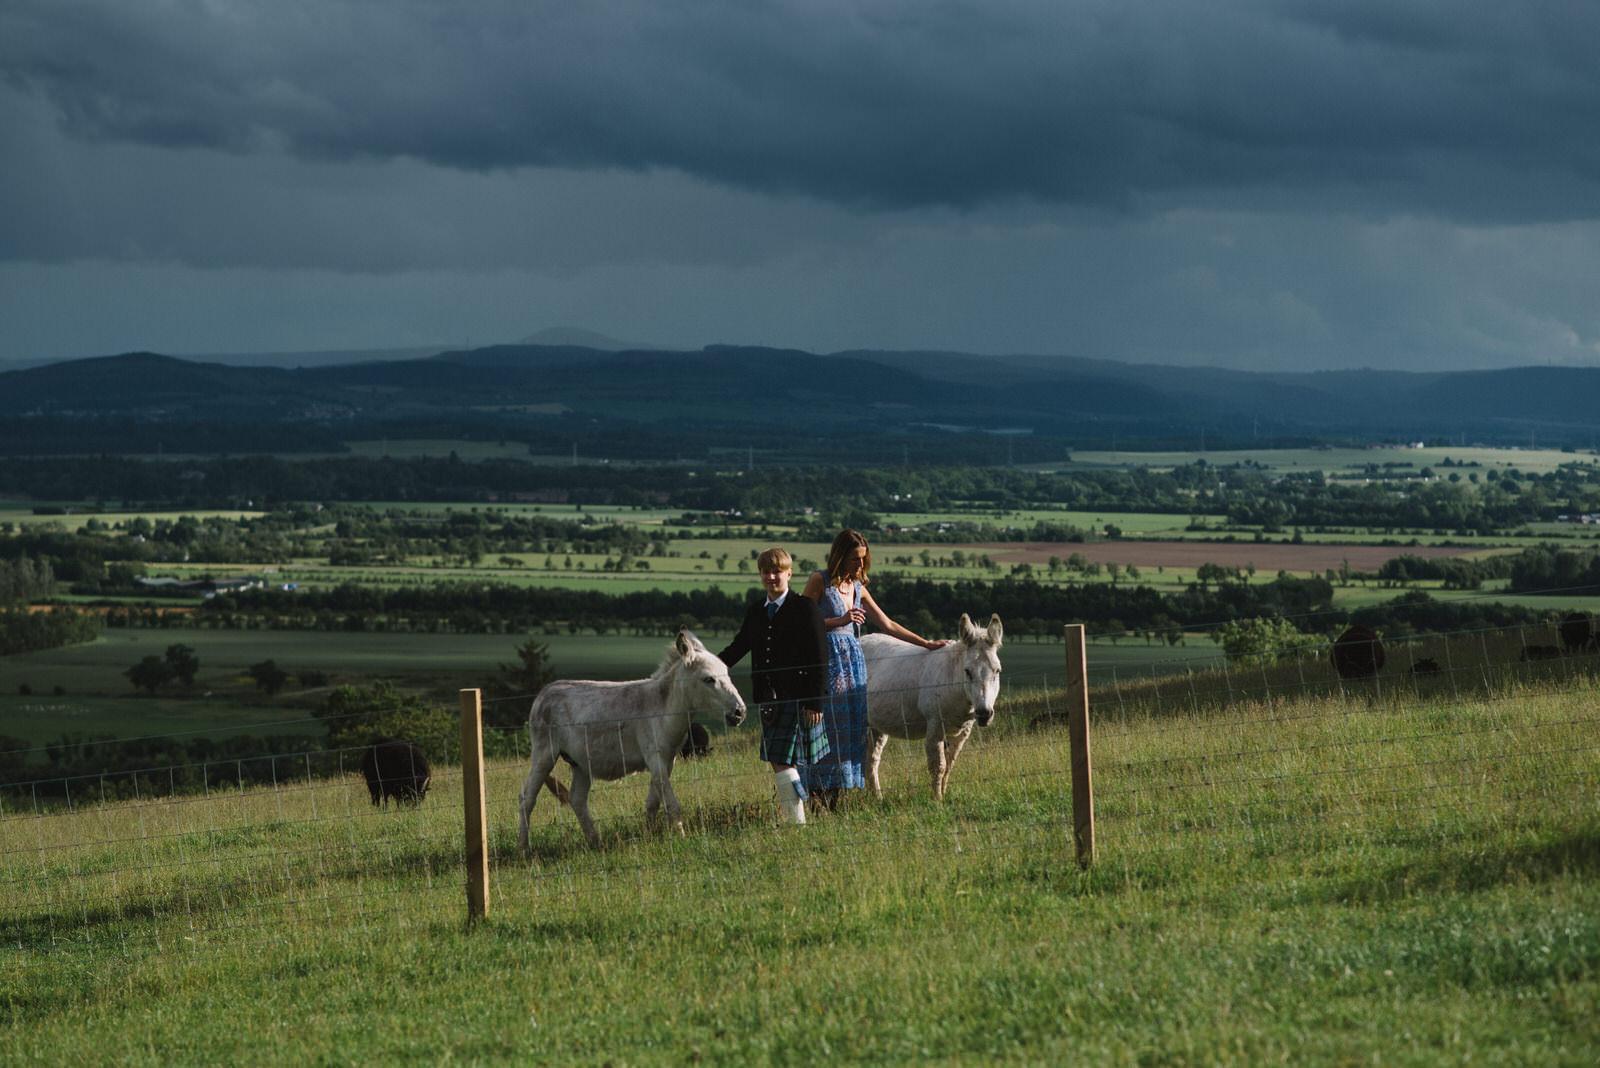 053-GUARDSWELL-FARM-WEDDING-ALTERNATIVE-SCOTTISH-WEDDING-PHOTOGRAPHER-SCOTTISH-WEDDING-DESTINATION-WEDDING-PHOTOGRAPHER.JPG